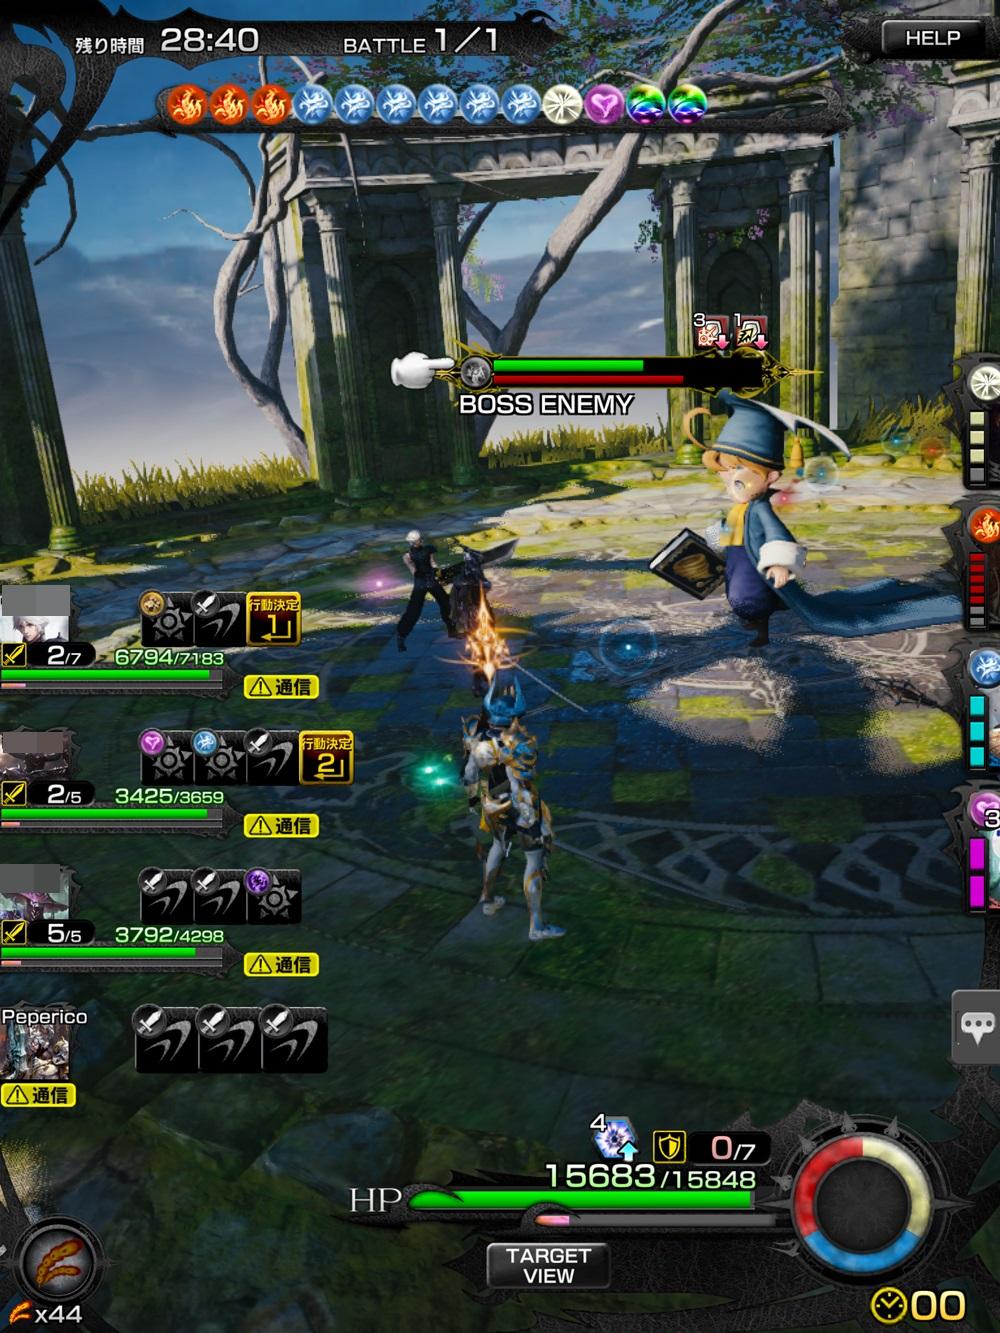 mobius final fantasy multiplayer connection error koukoupuffs